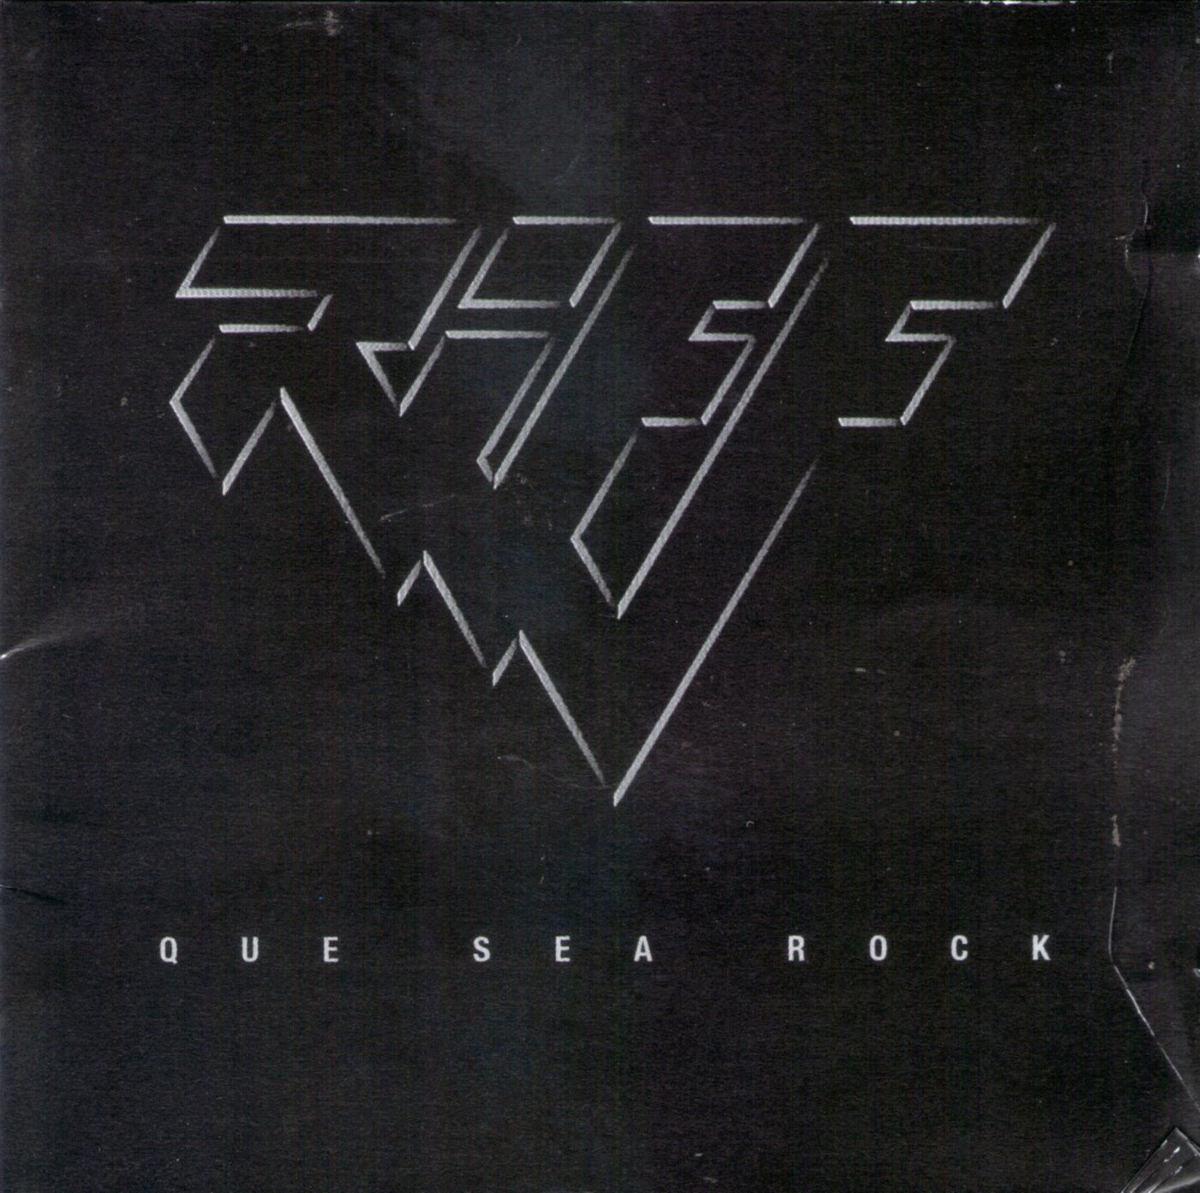 riff que sea rock 2 cd primera edicion los chiquibum 539